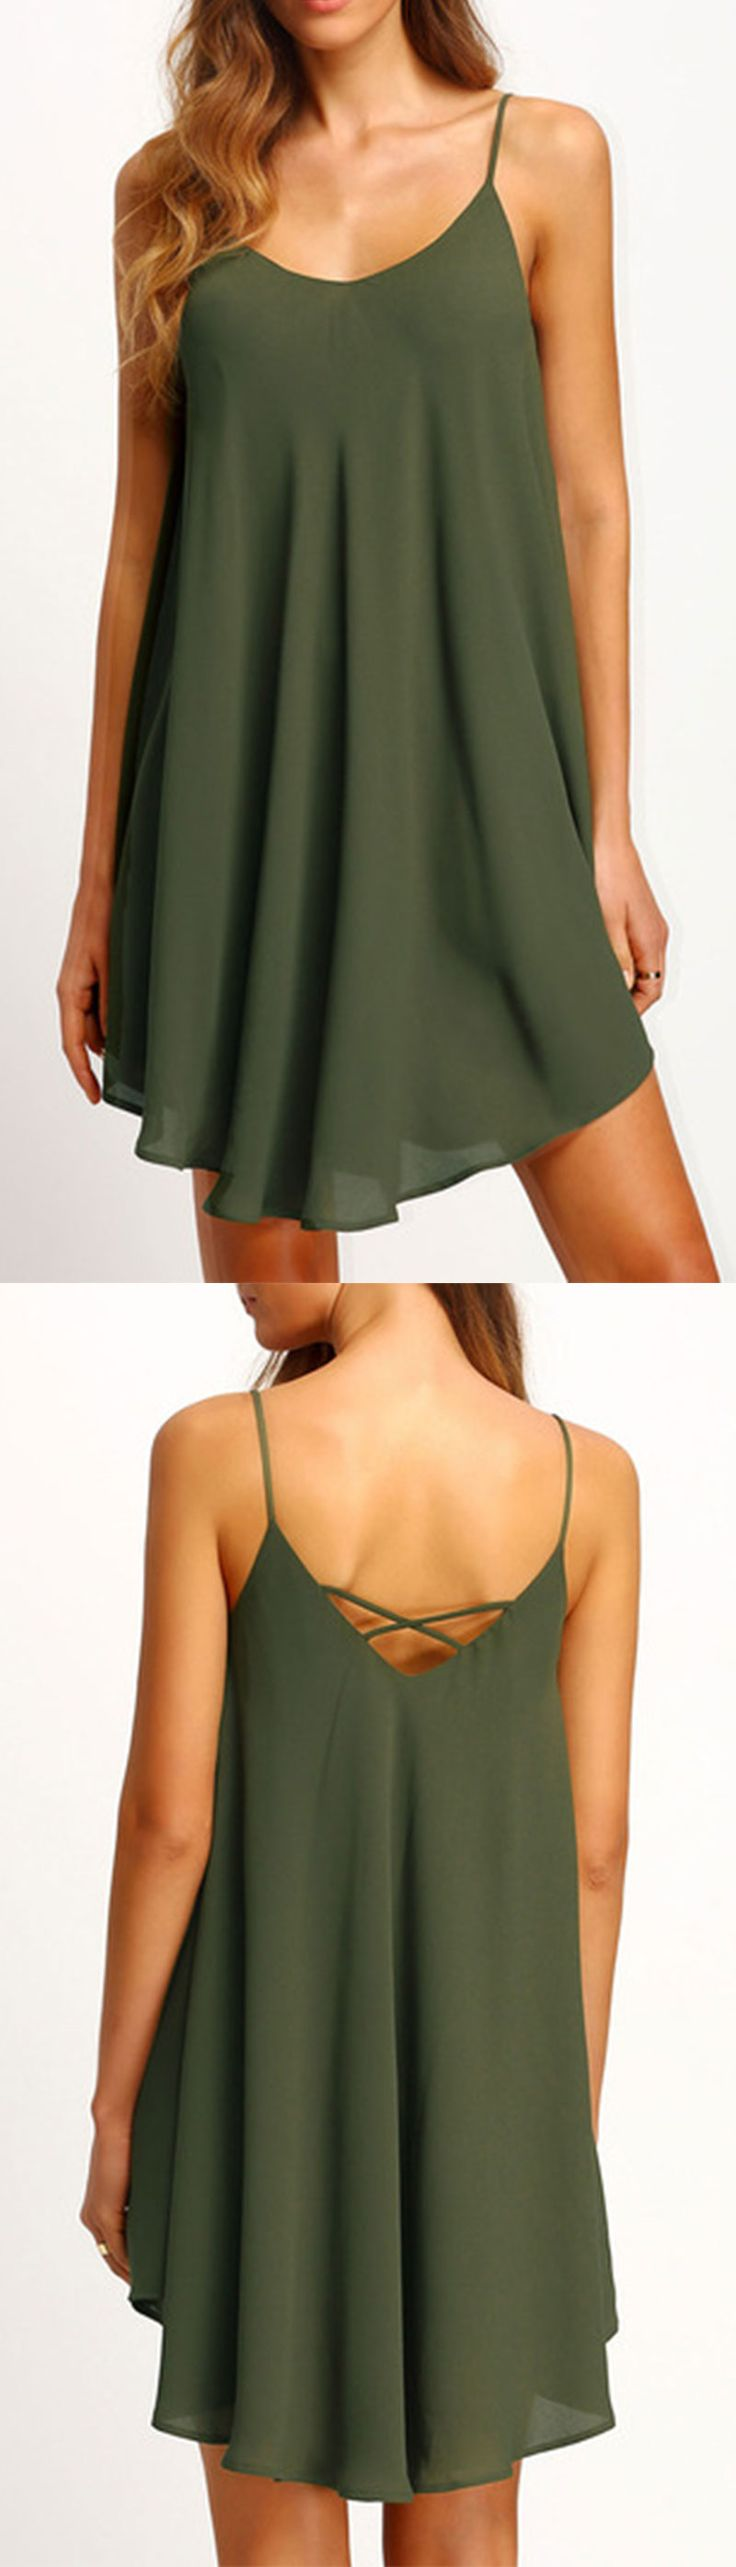 Army Green Asymmetrical Criss Cross Back Spaghetti Strap Sundress